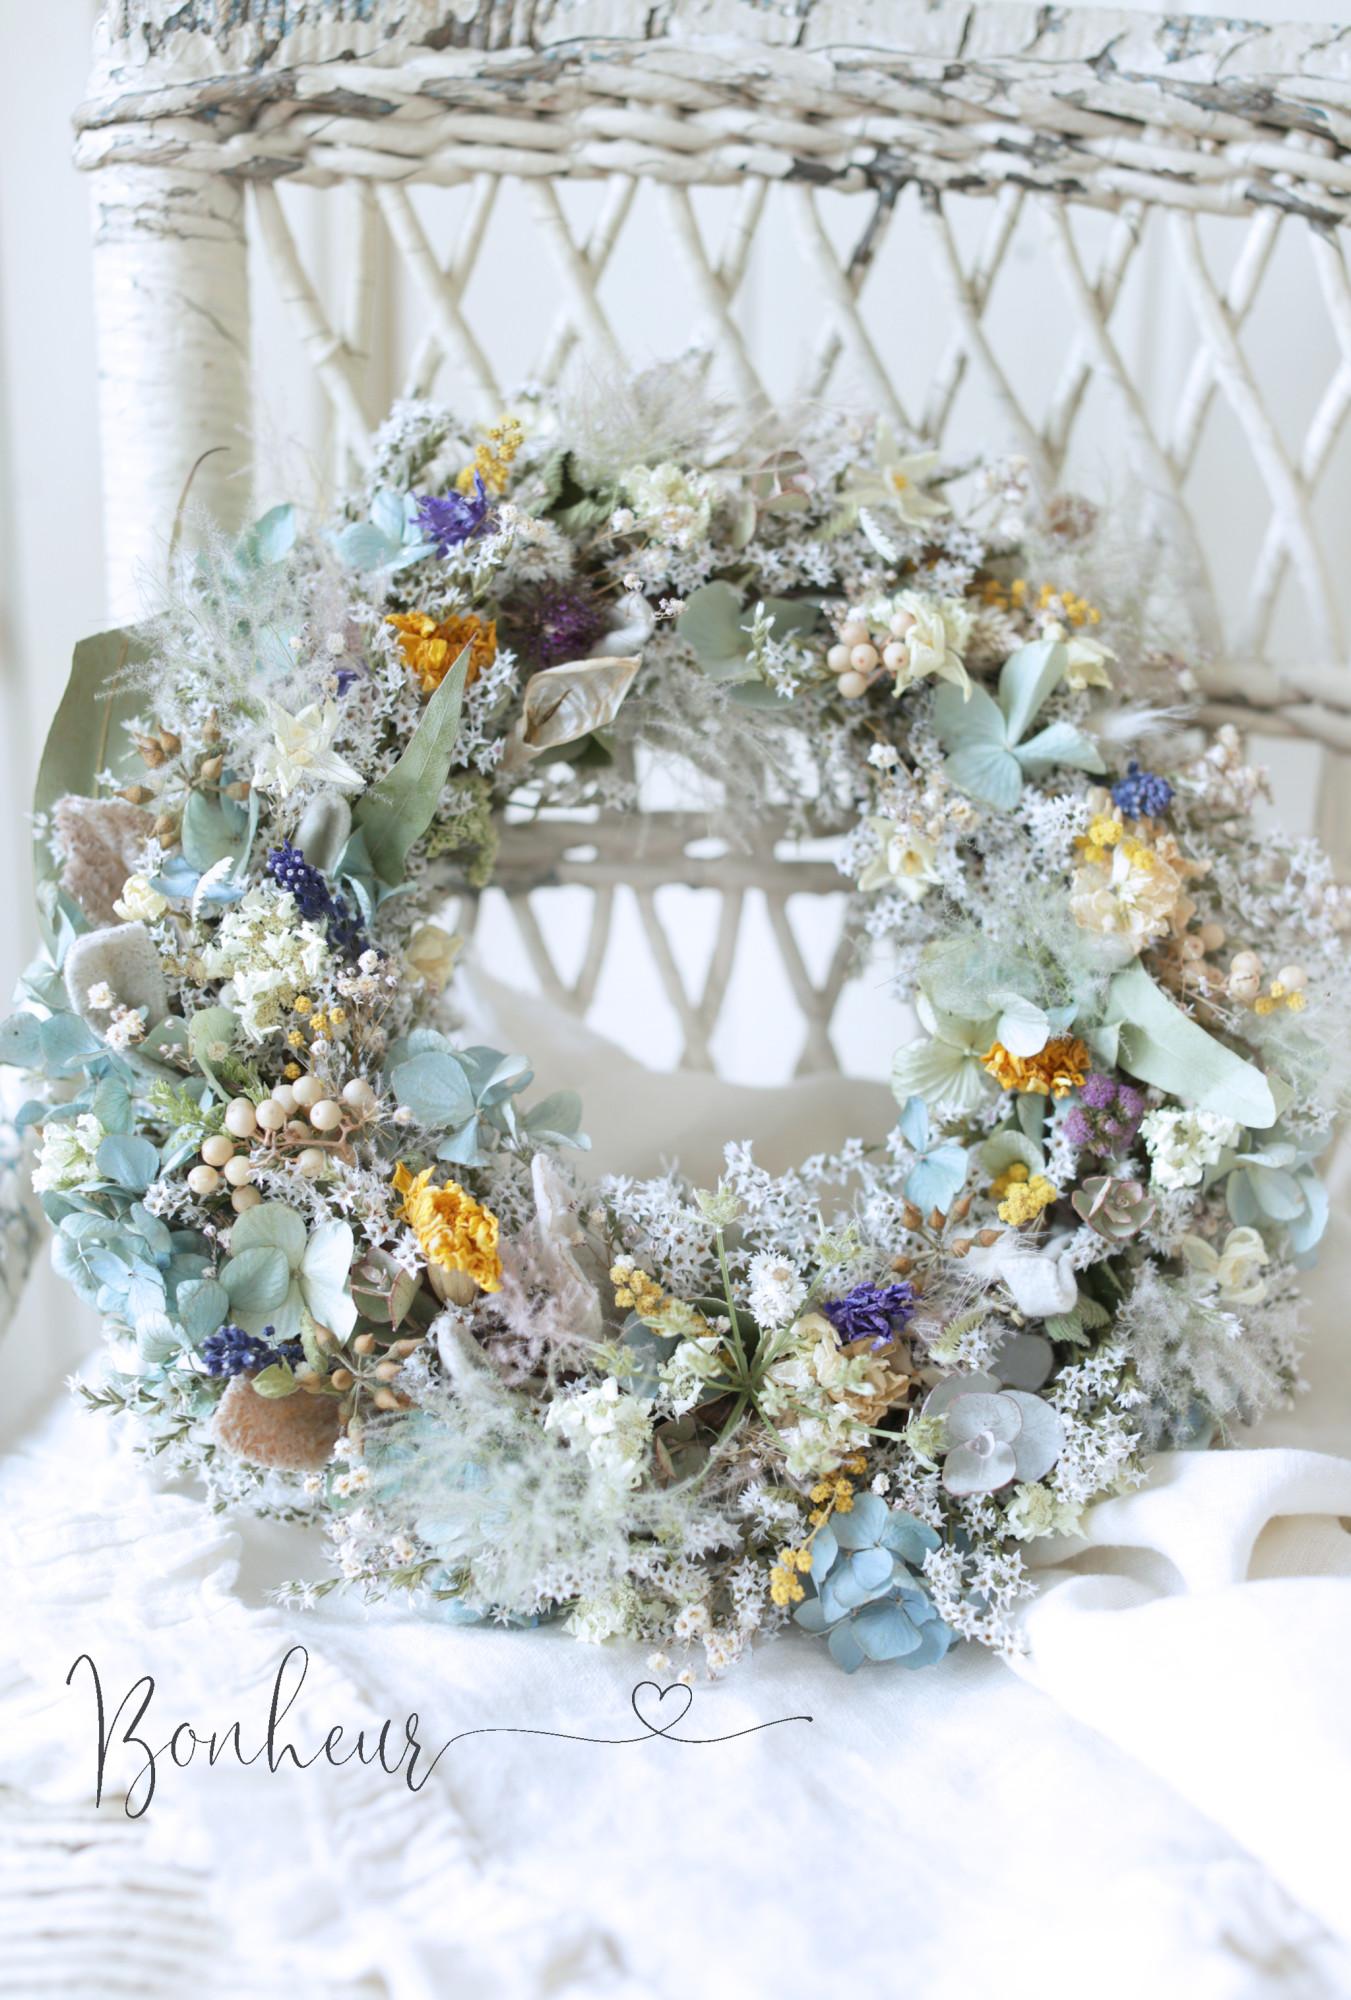 b_wreath20180609_3